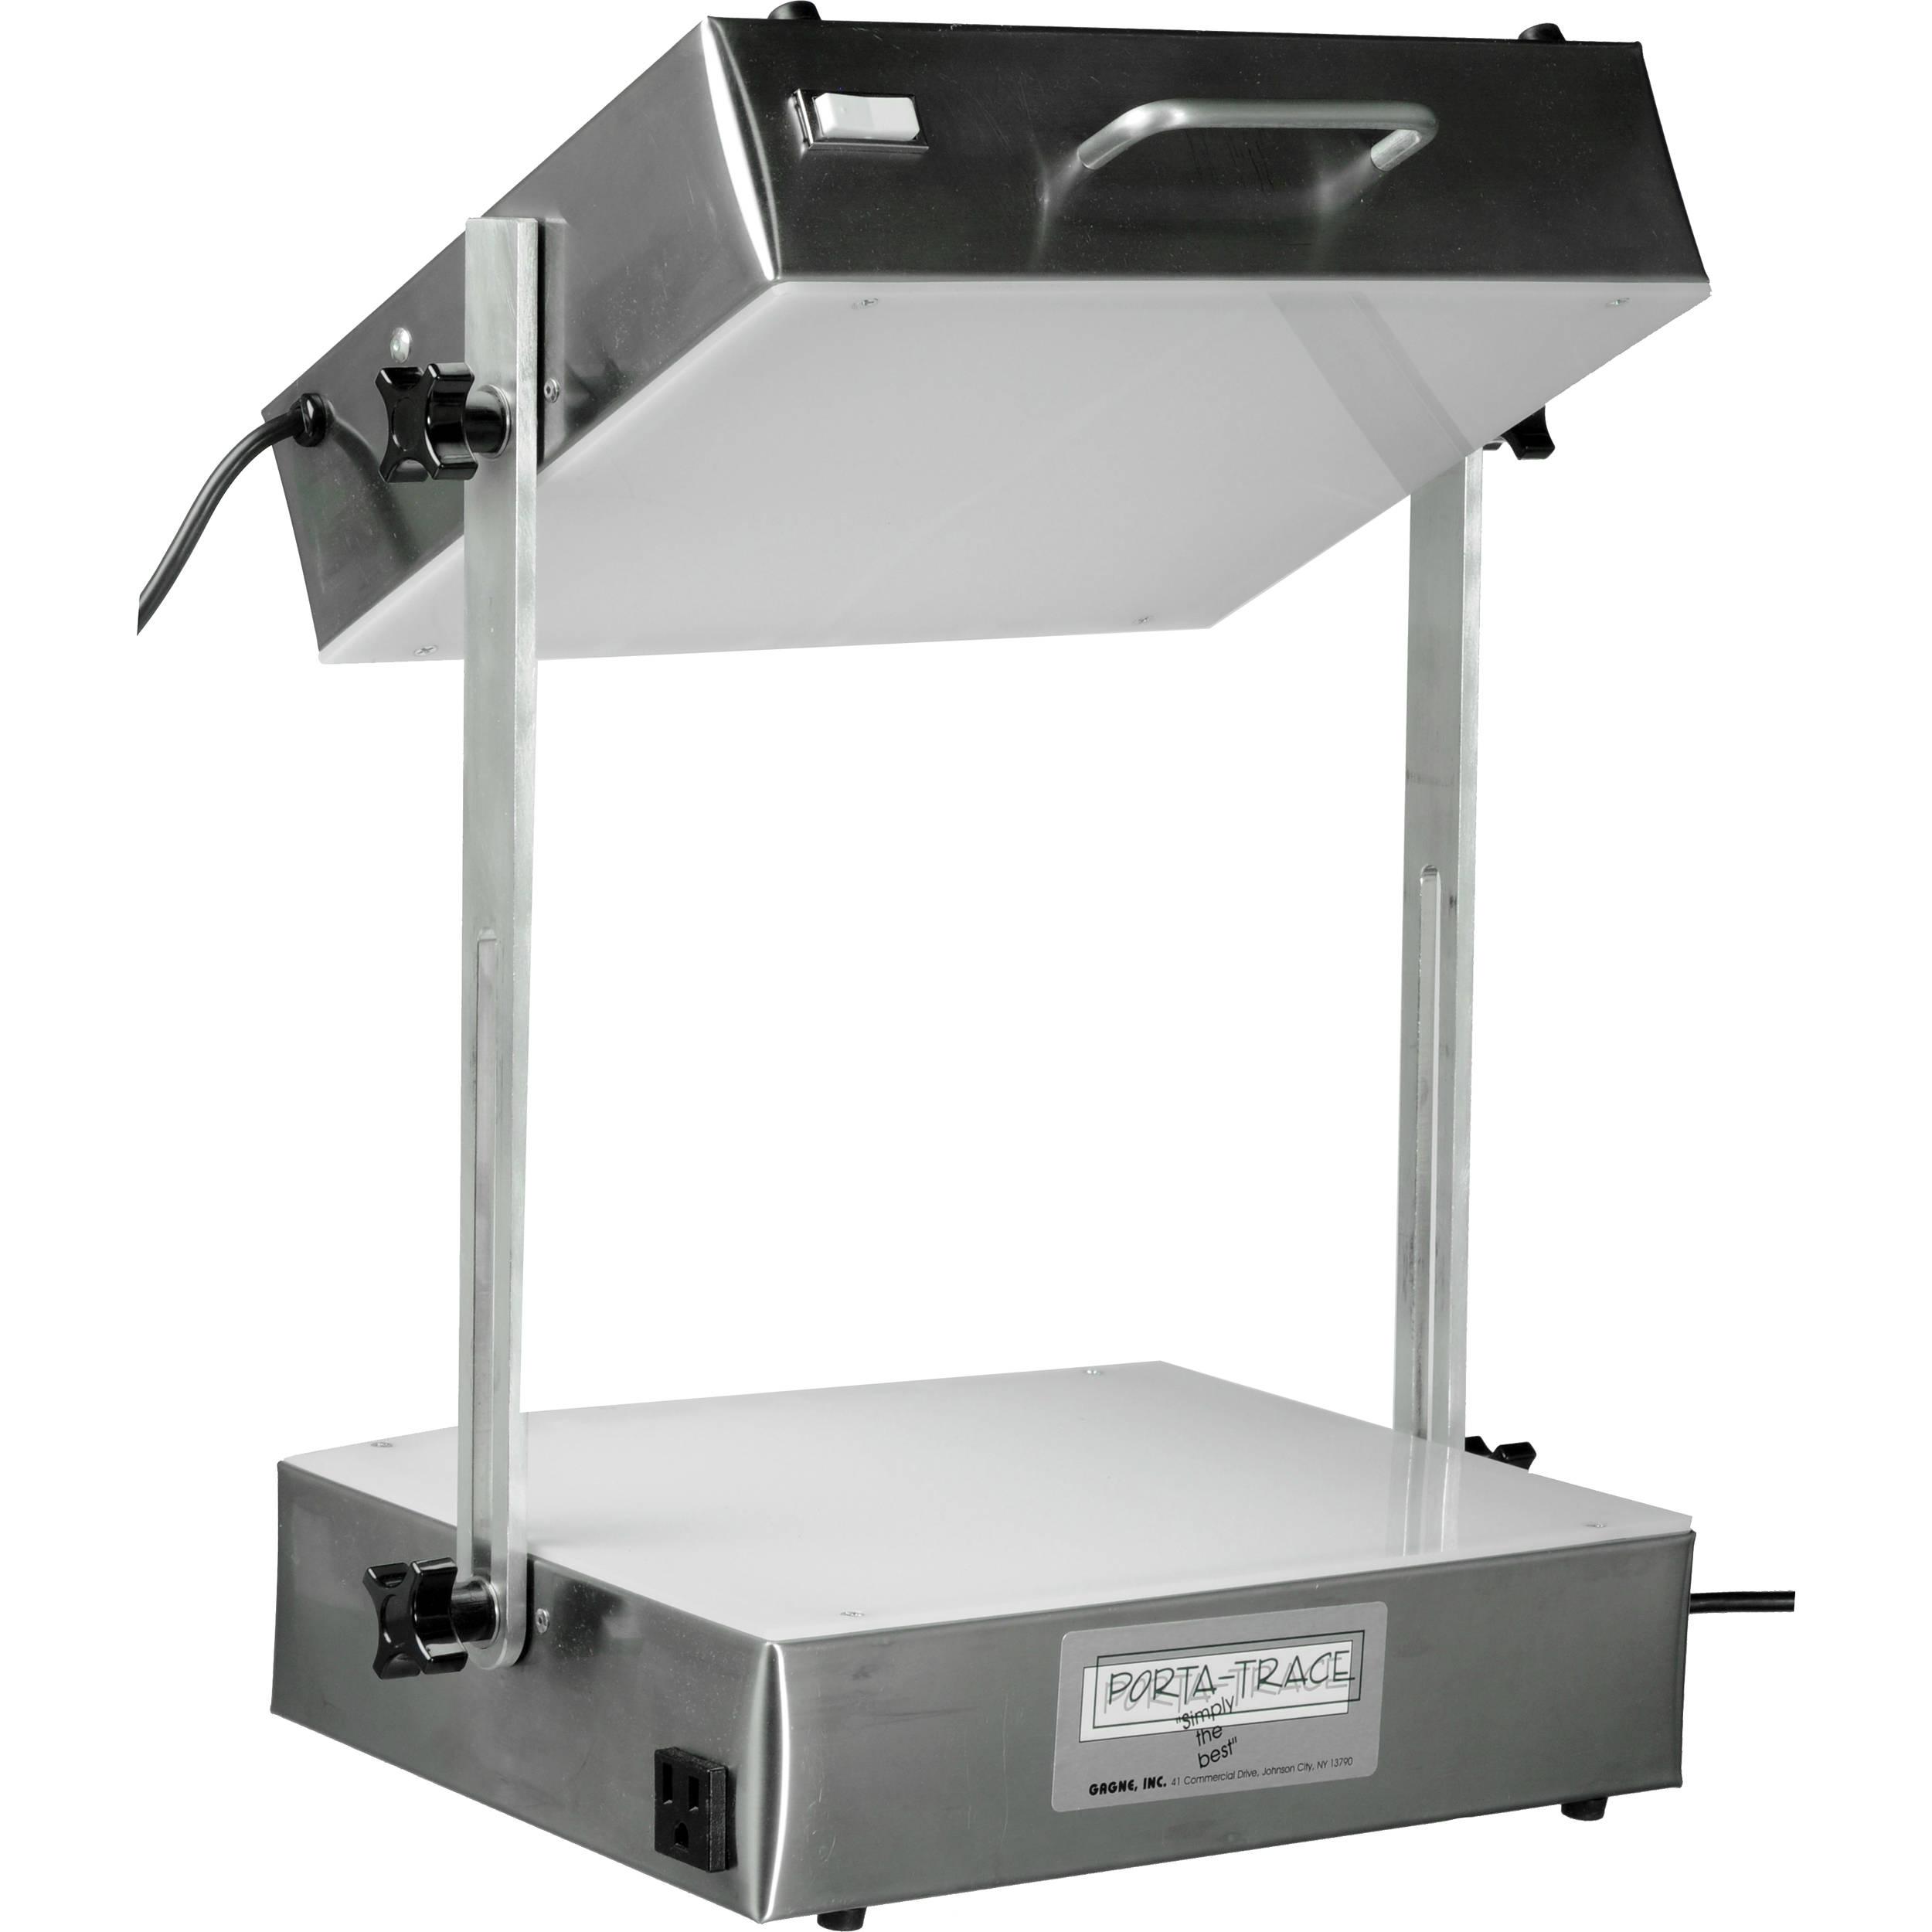 Portable Product Photography Studio With Lighting: Porta-Trace / Gagne Portable Photography Lighting PORTA-STUDIO